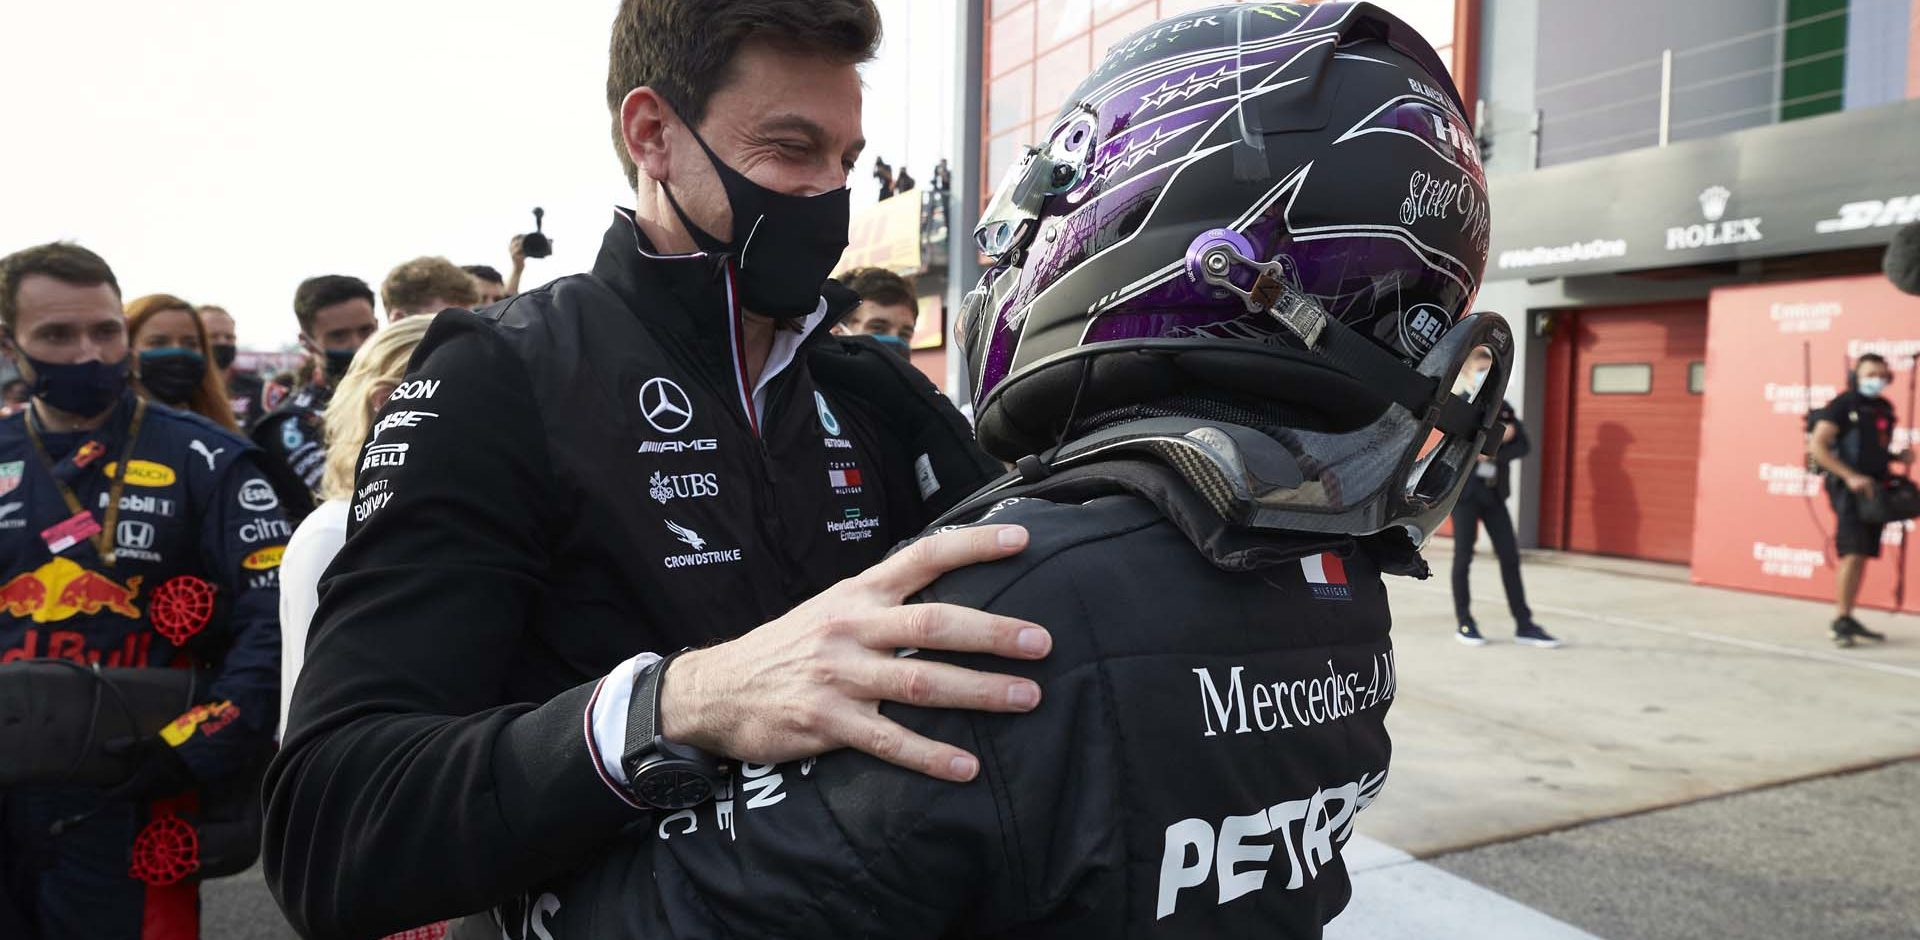 2020 Emilia Romagna Grand Prix, Sunday - Steve Etherington Toto Wolff Lewis Hamilton